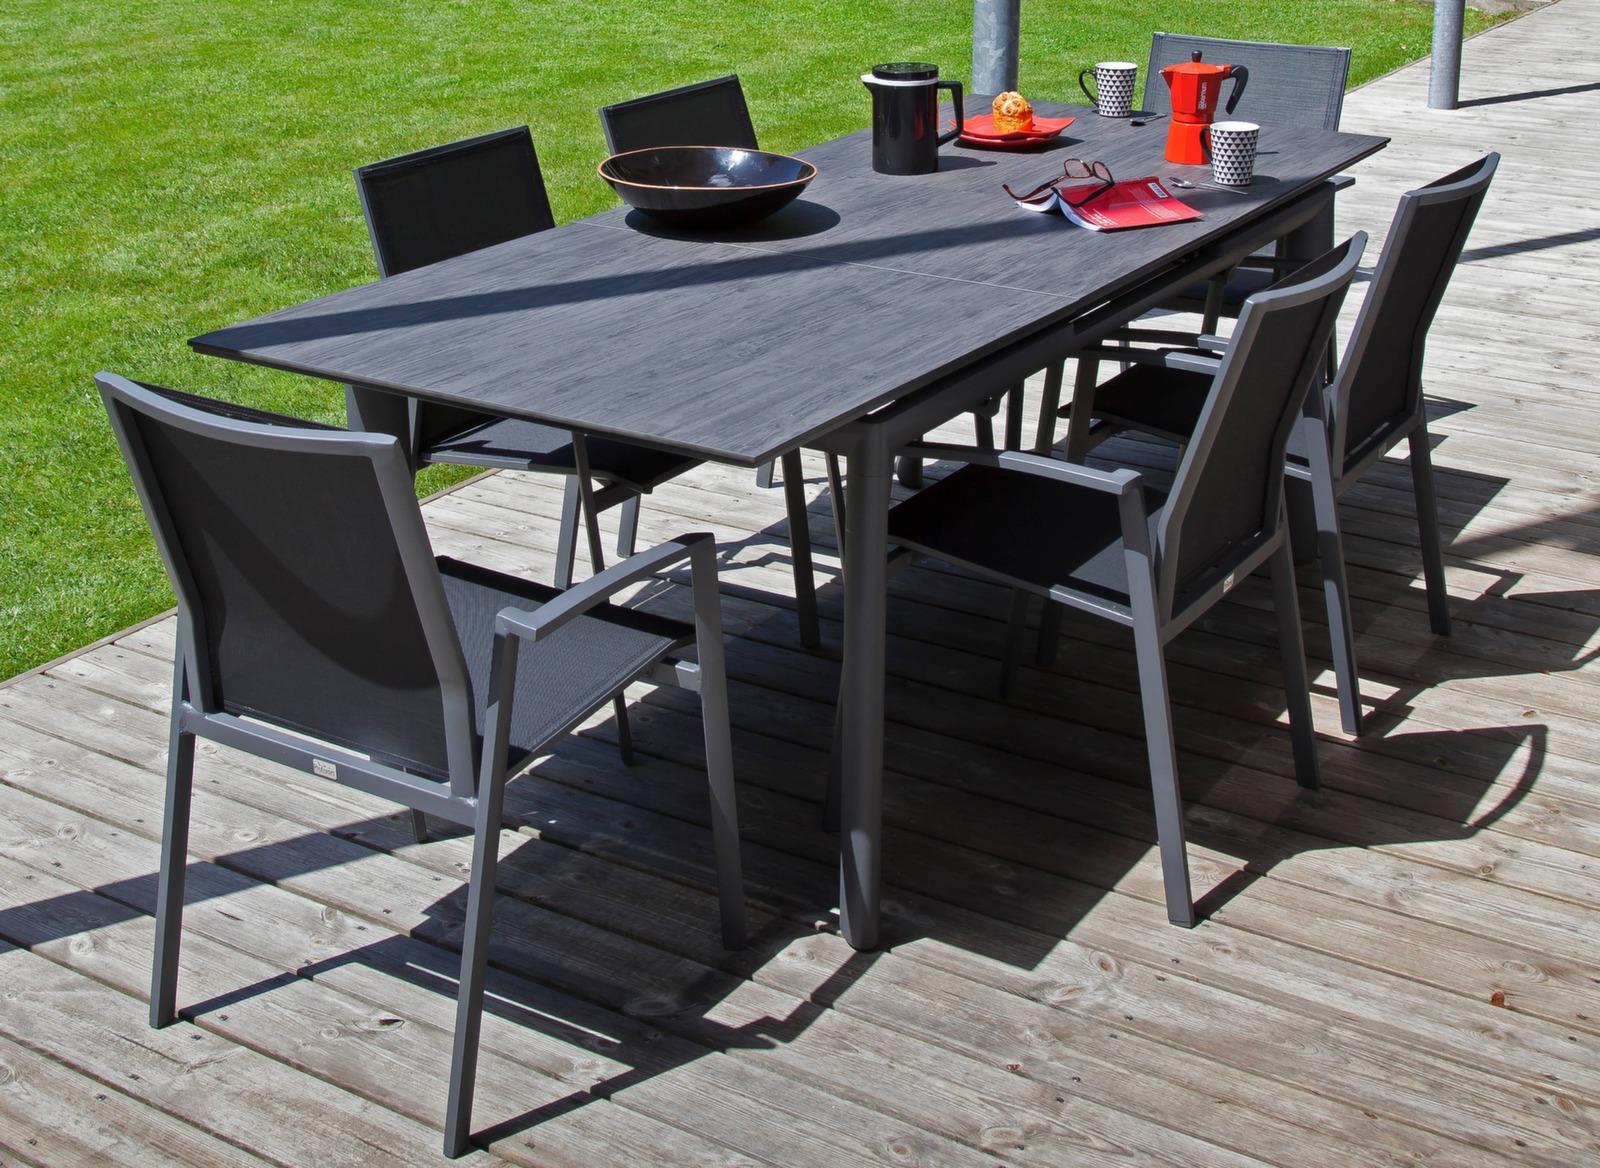 table de jardin rectangle miami 220cm en exclusivit proloisirs. Black Bedroom Furniture Sets. Home Design Ideas